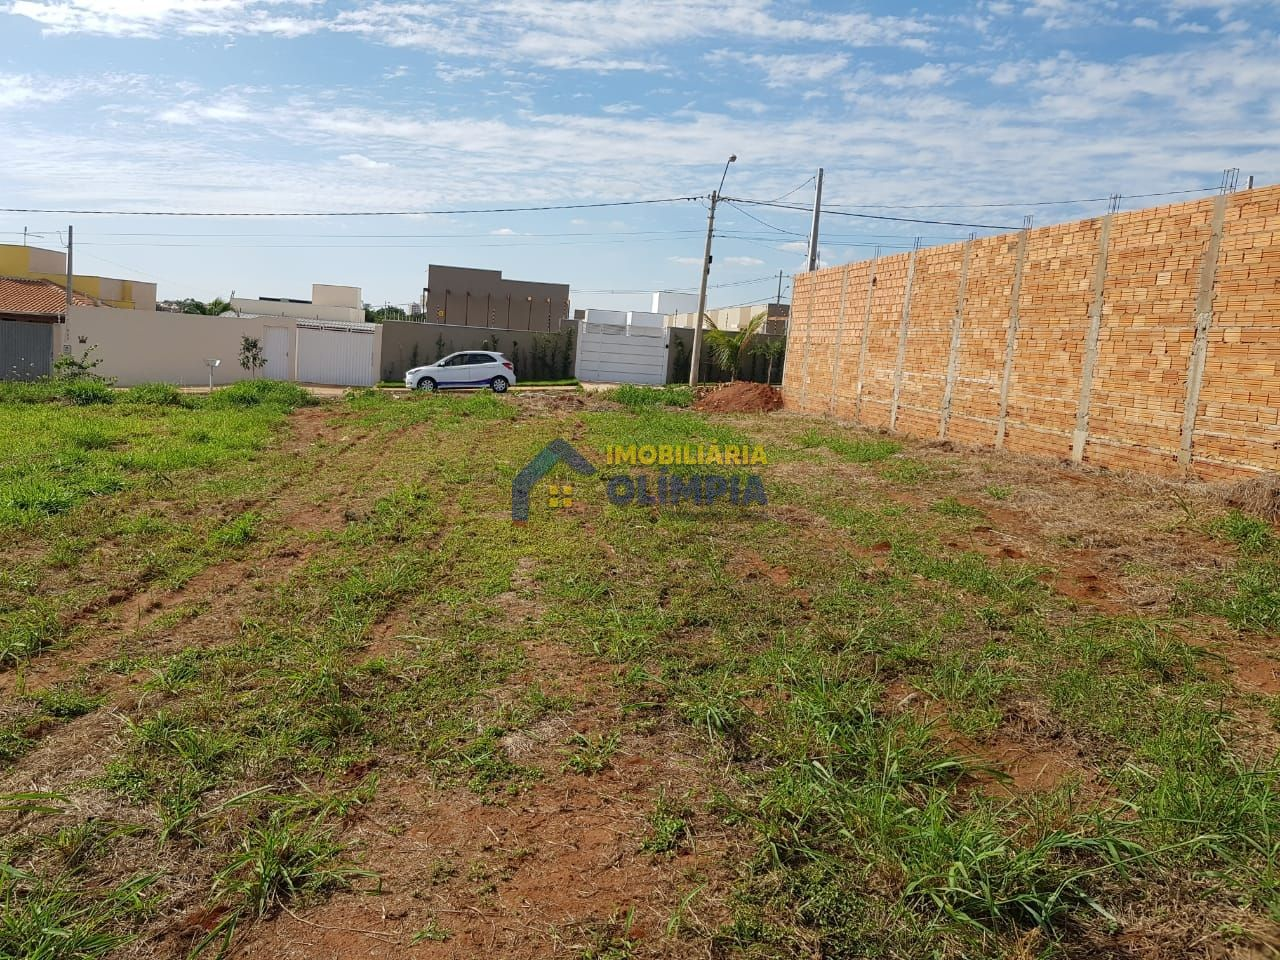 Terreno/Lote à venda  no Centro - OlÍmpia, SP. Imóveis